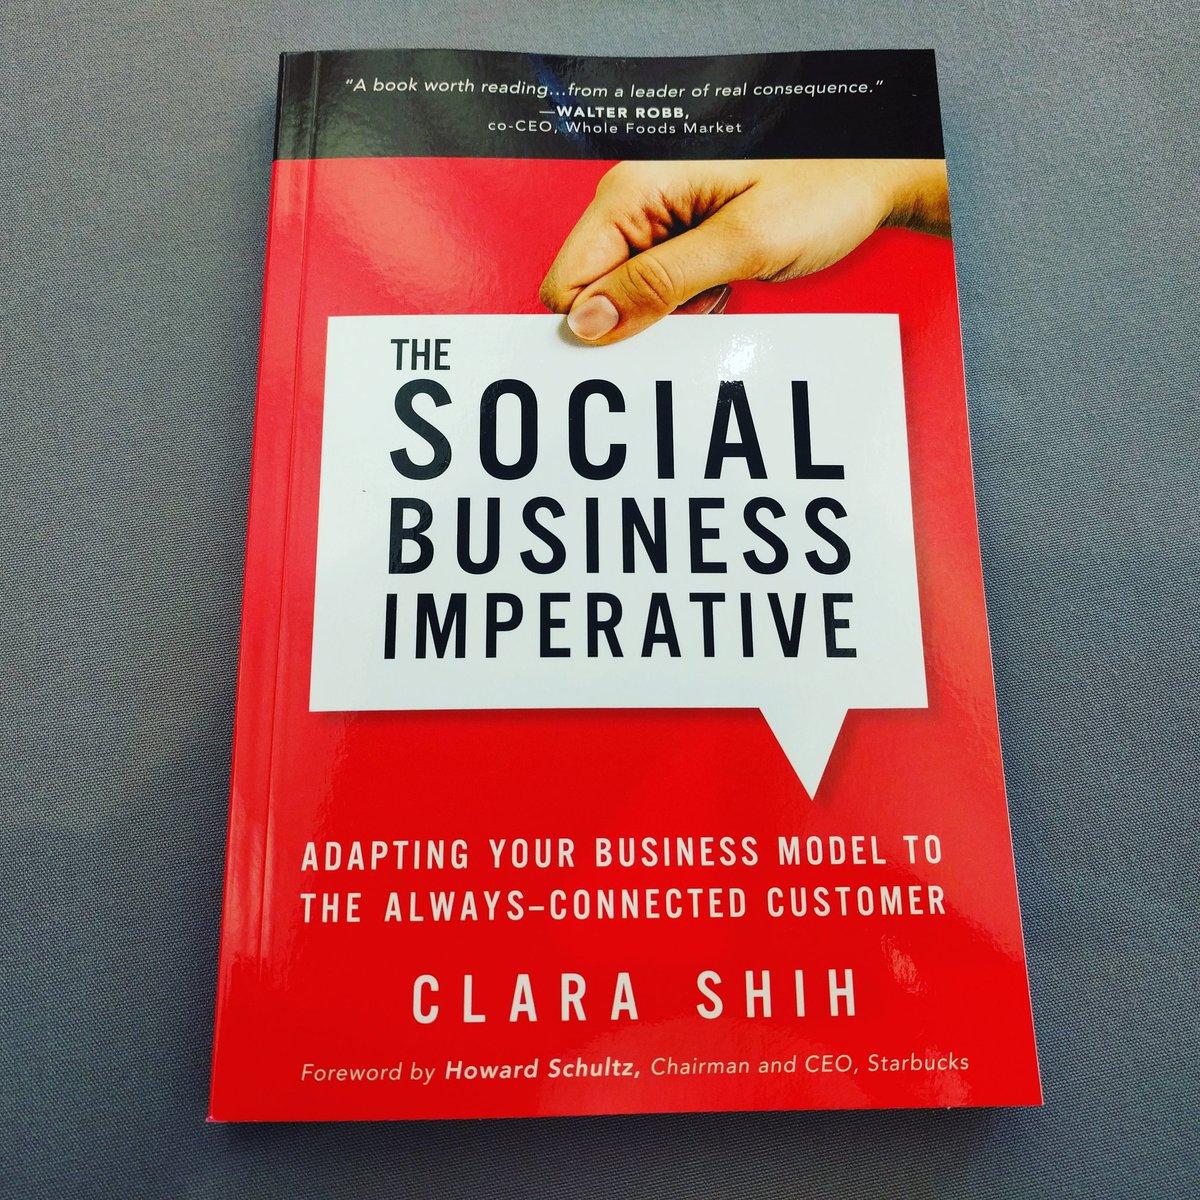 Launch day #socialbizimperative https://t.co/kh1AxHLfCH https://t.co/jC39vMbgma